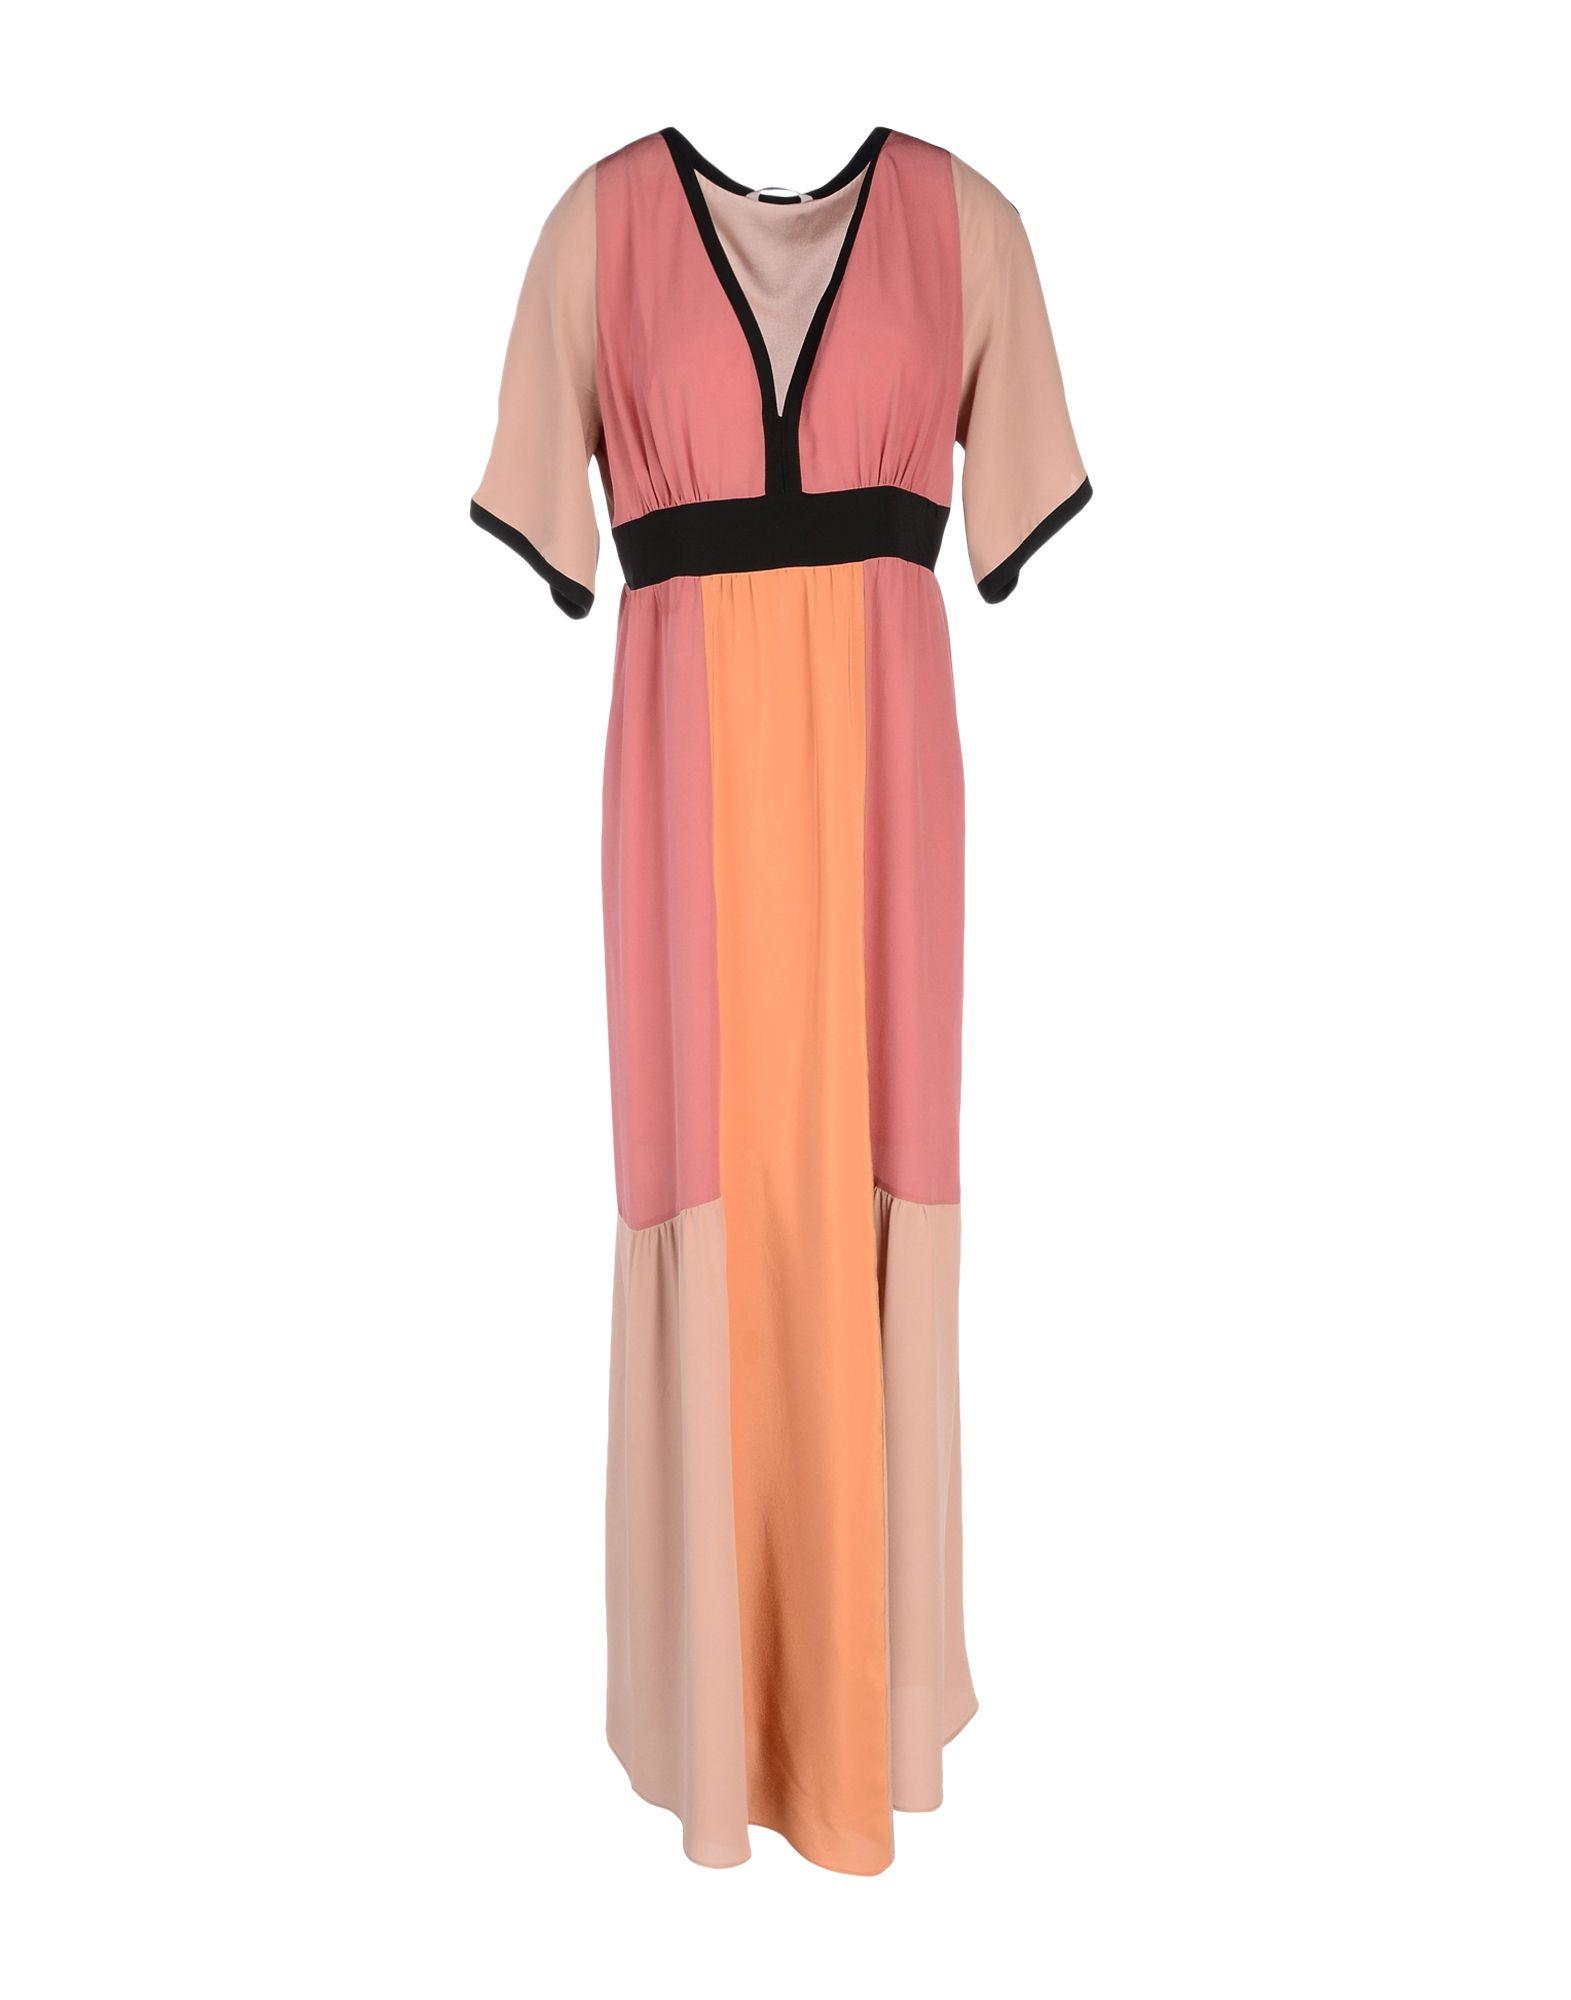 цена  MIKI THUMB Длинное платье  онлайн в 2017 году